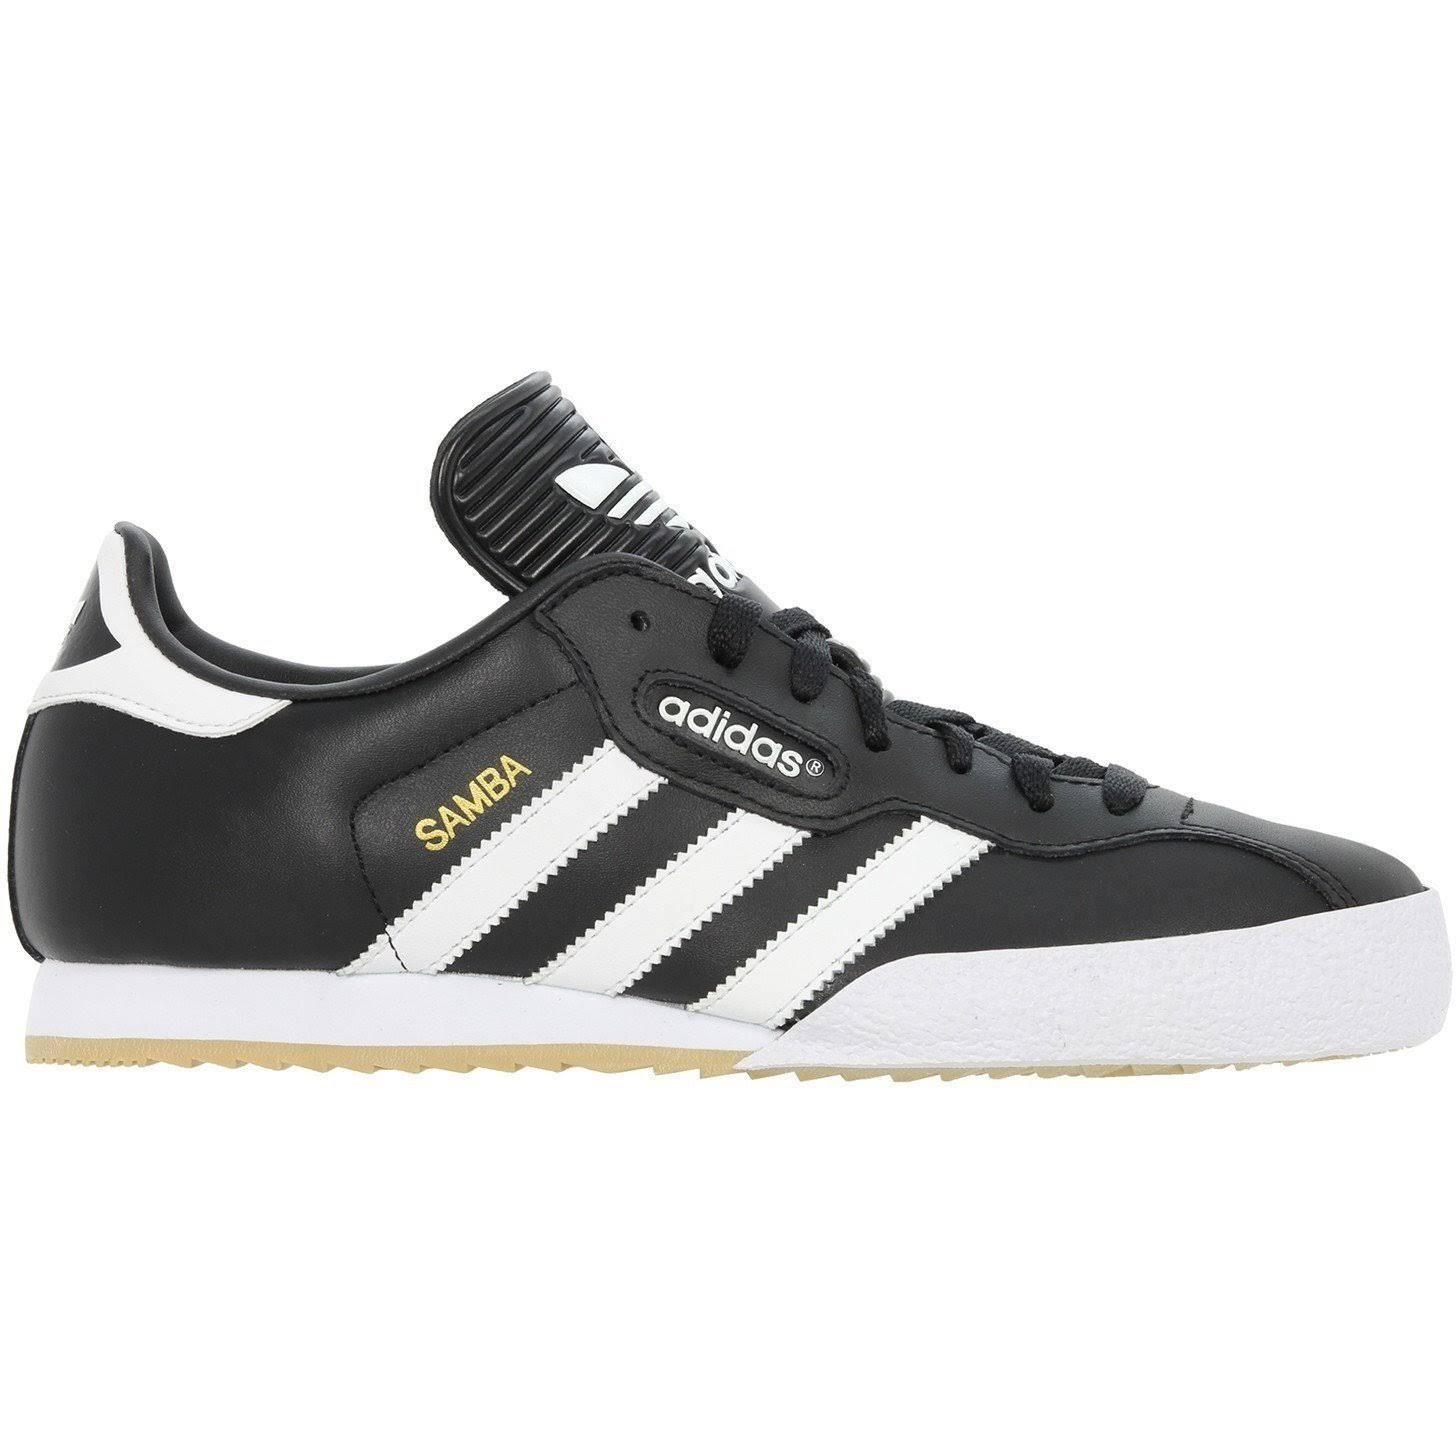 (8.5) adidas Originals Samba Super Trainers - Black